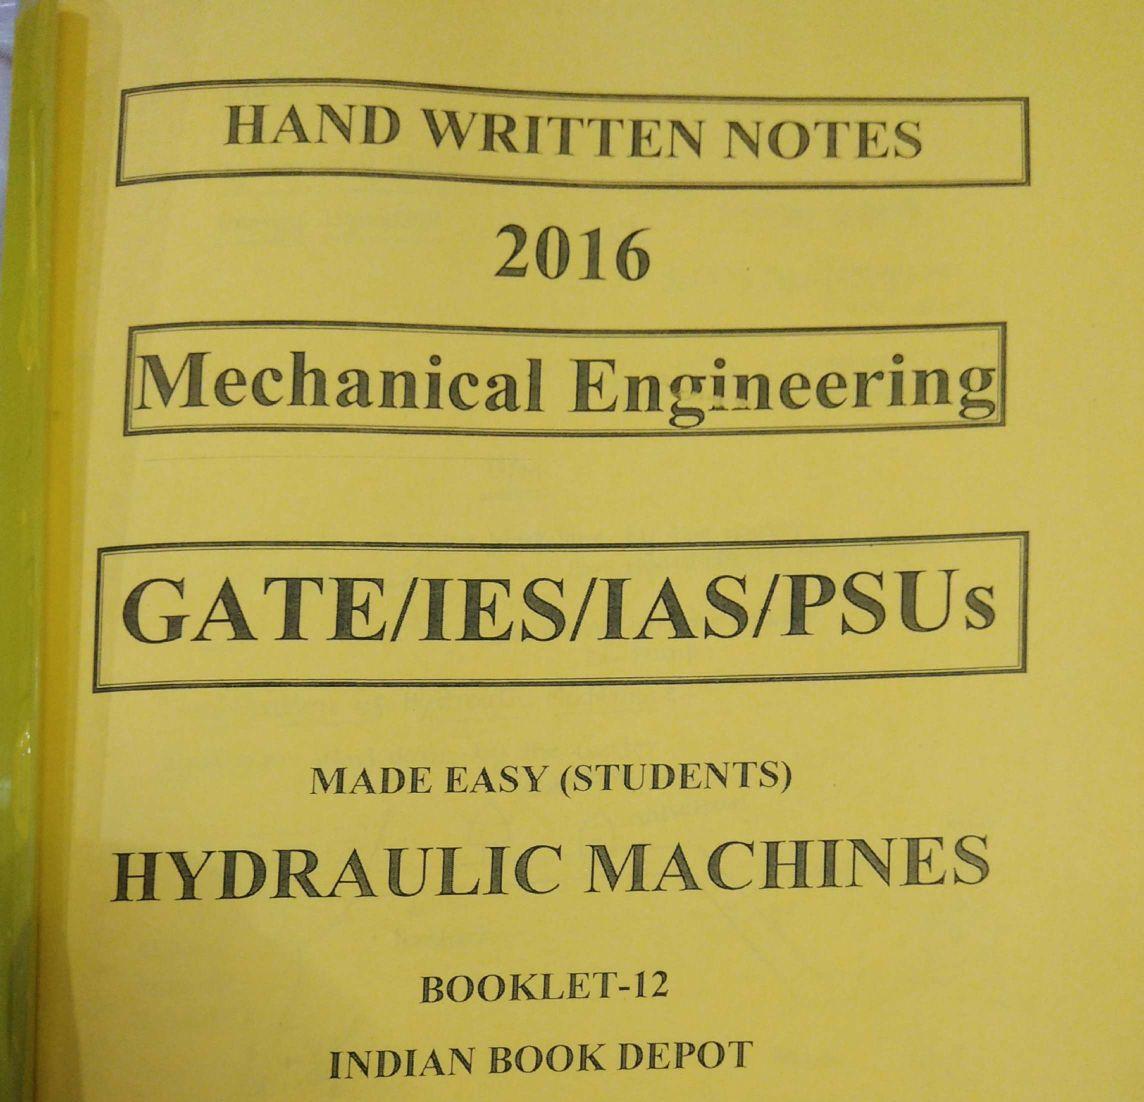 Made Easy - Mechanical Engineering - IES Study Material - English Medium -  Handwritten Class Notes